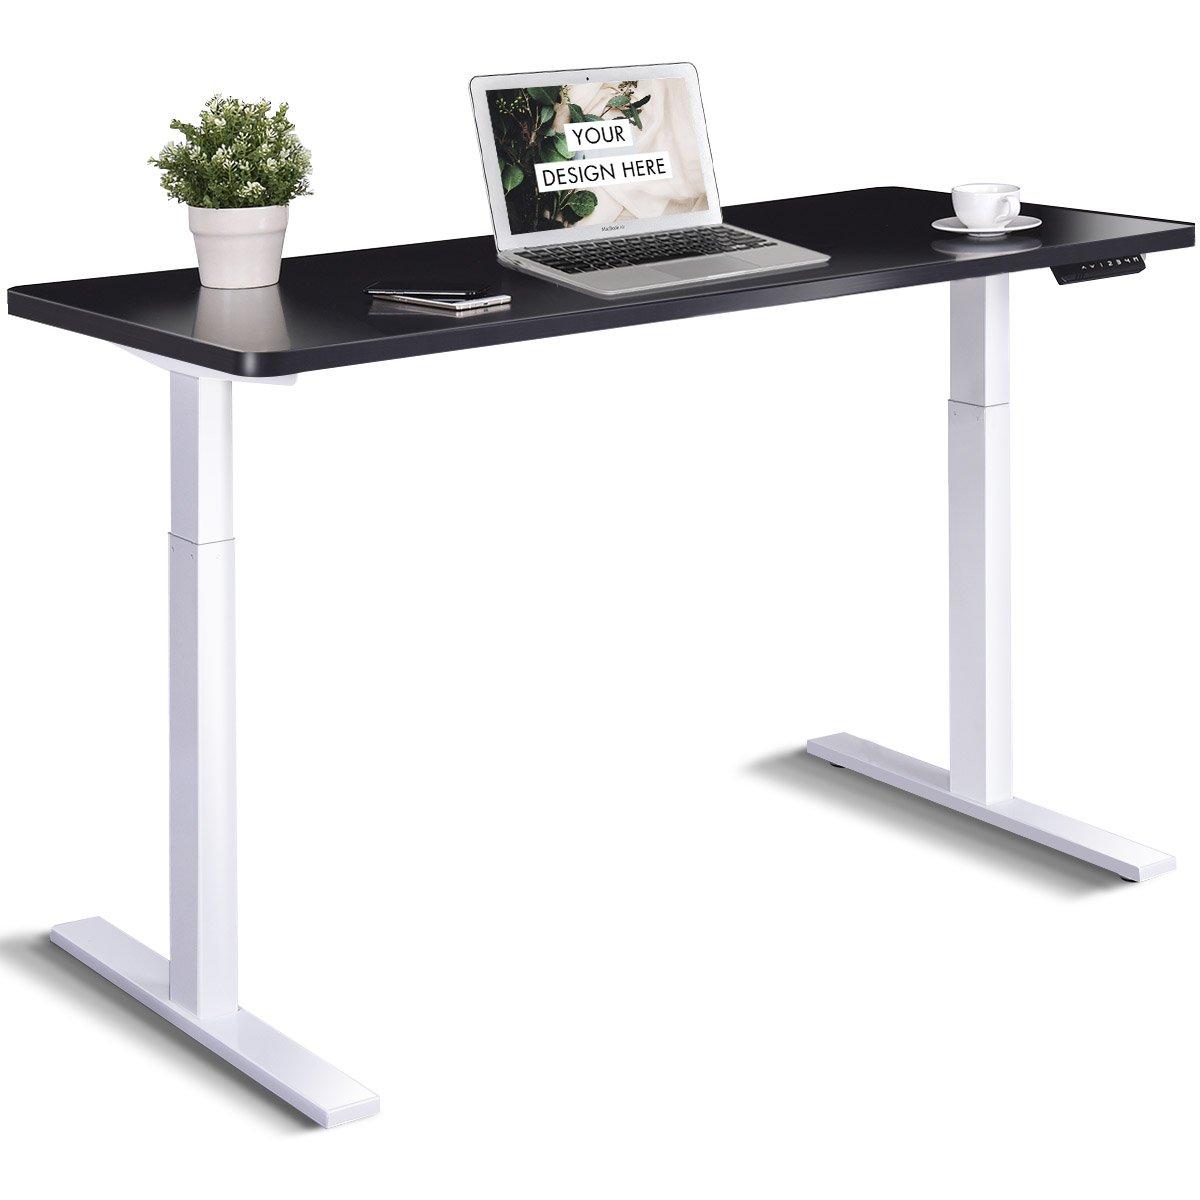 Tangkula Dual Motor Standing Desk Electric Height Adjustable Ergonomic Stand Up Desk Home Office Workstation (Black)